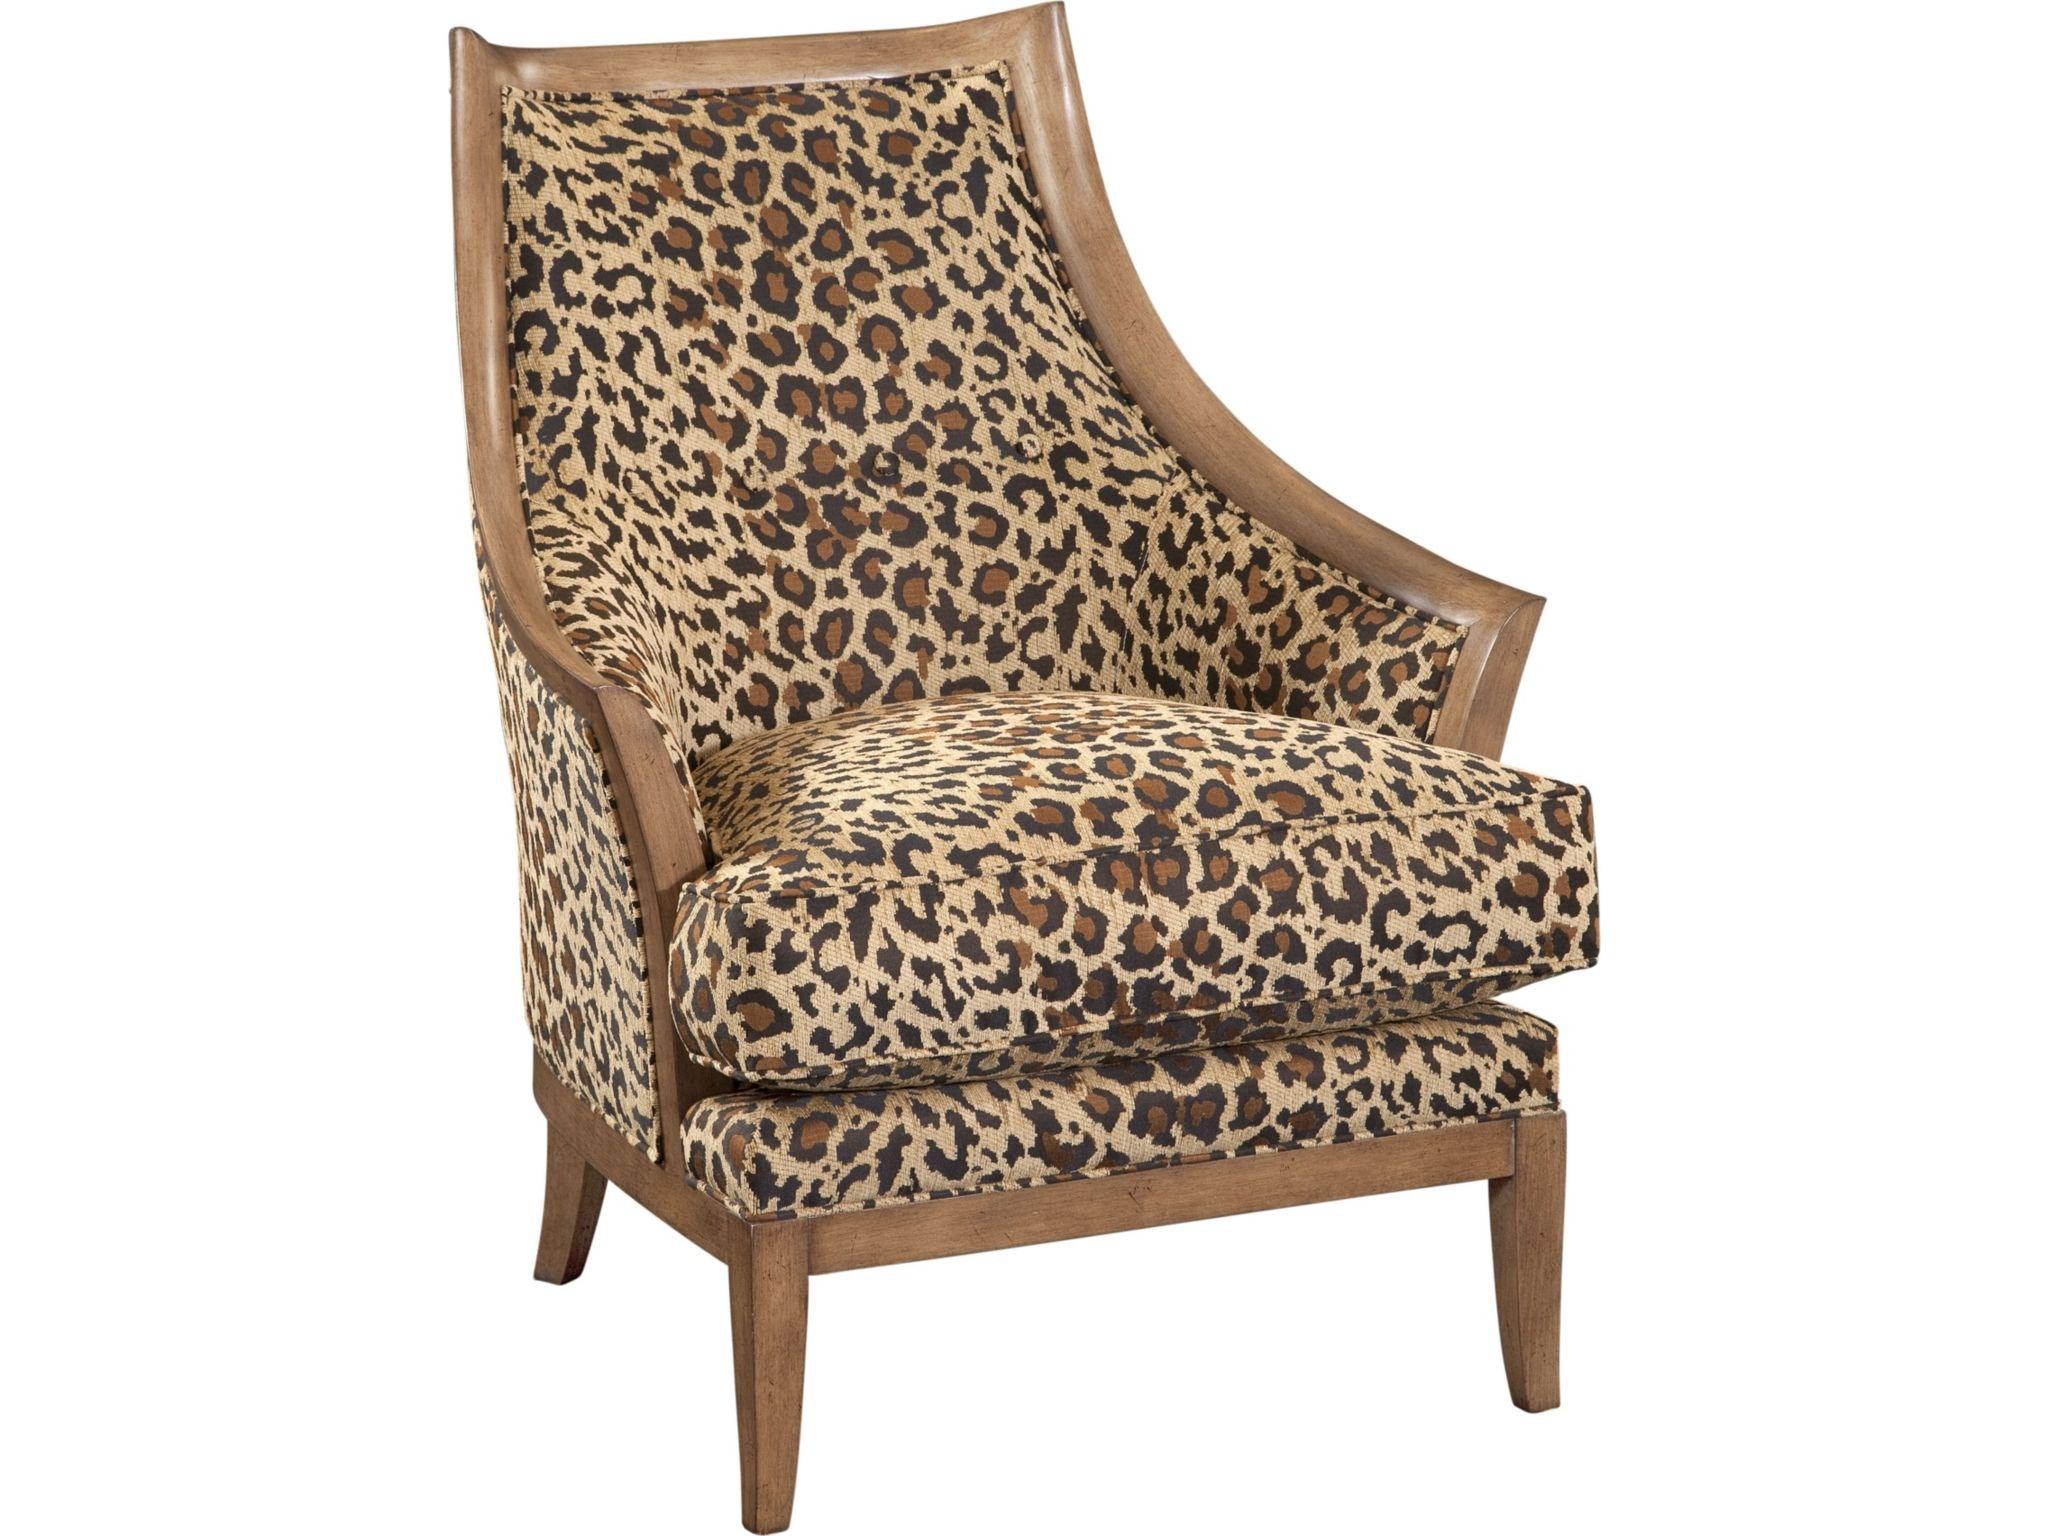 1580 15. Madrid Chair